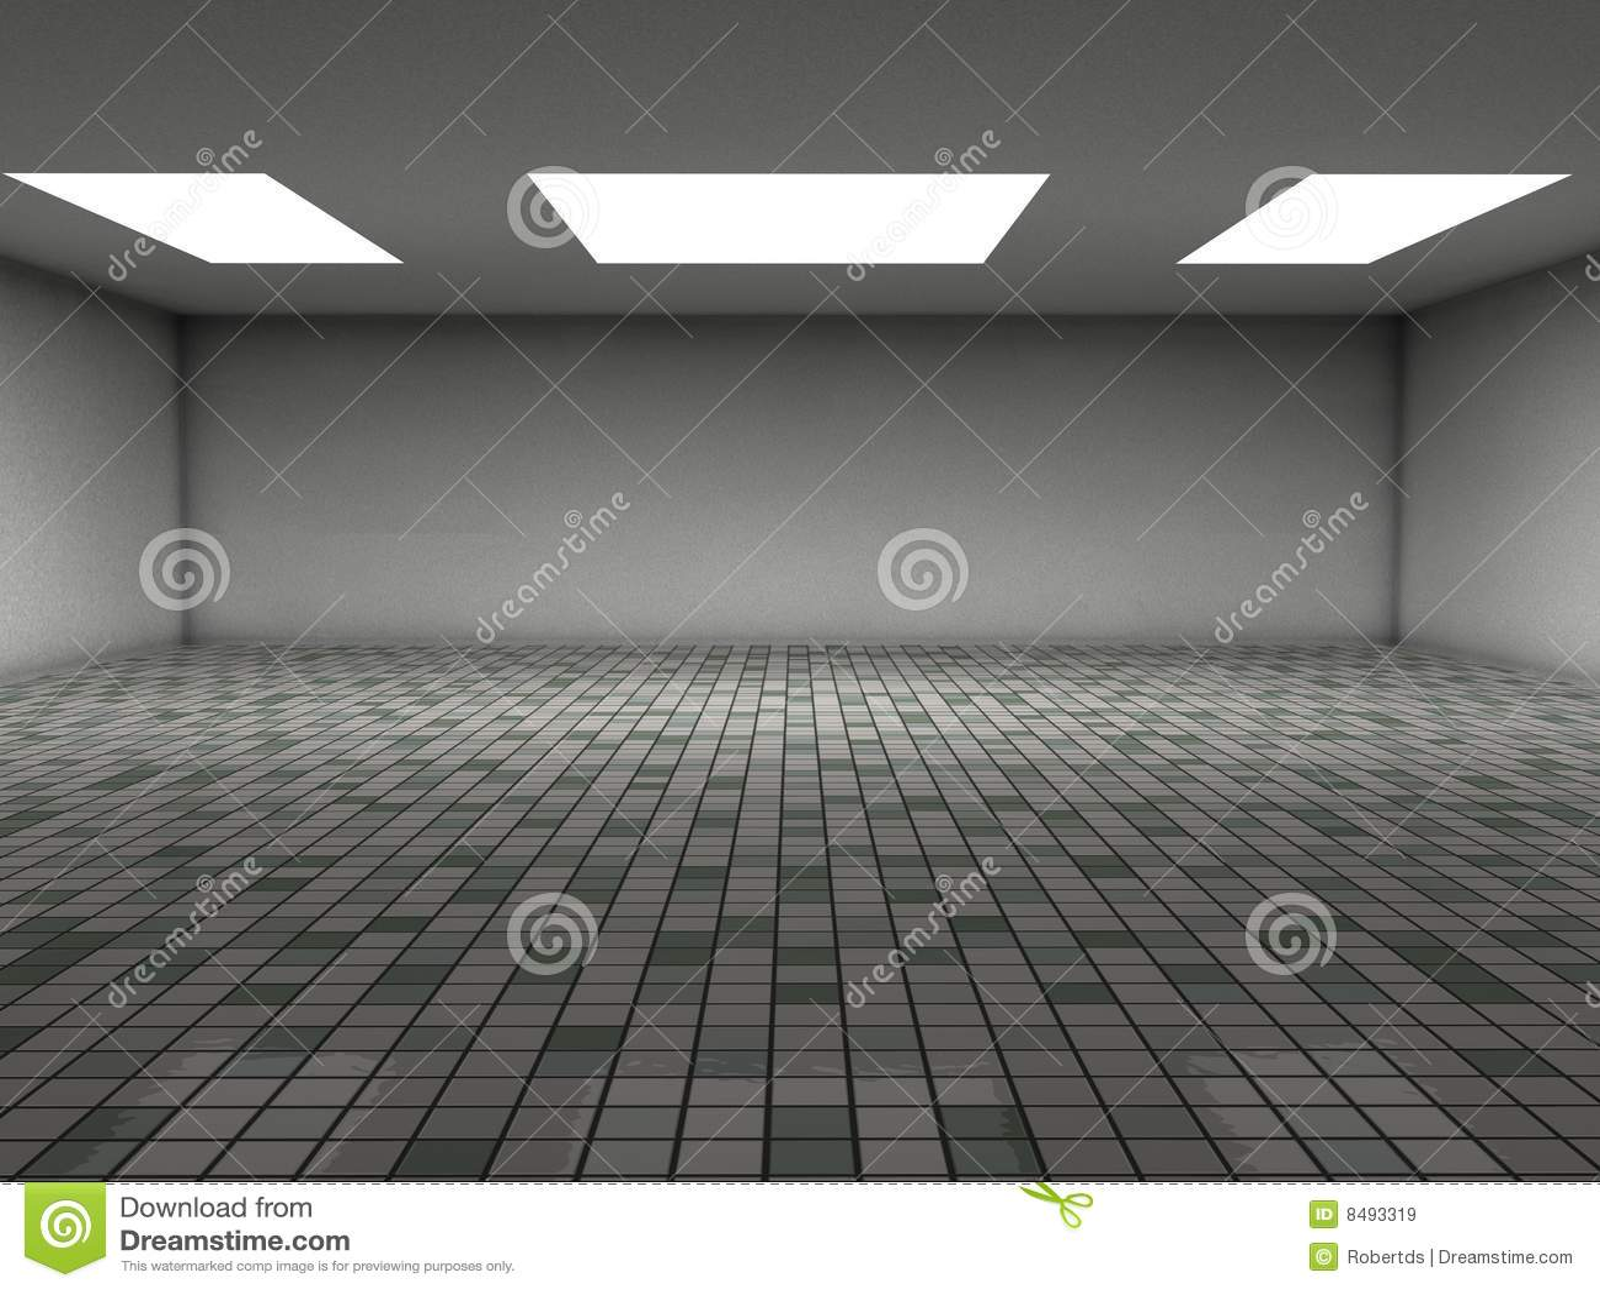 Ceramic tiles room